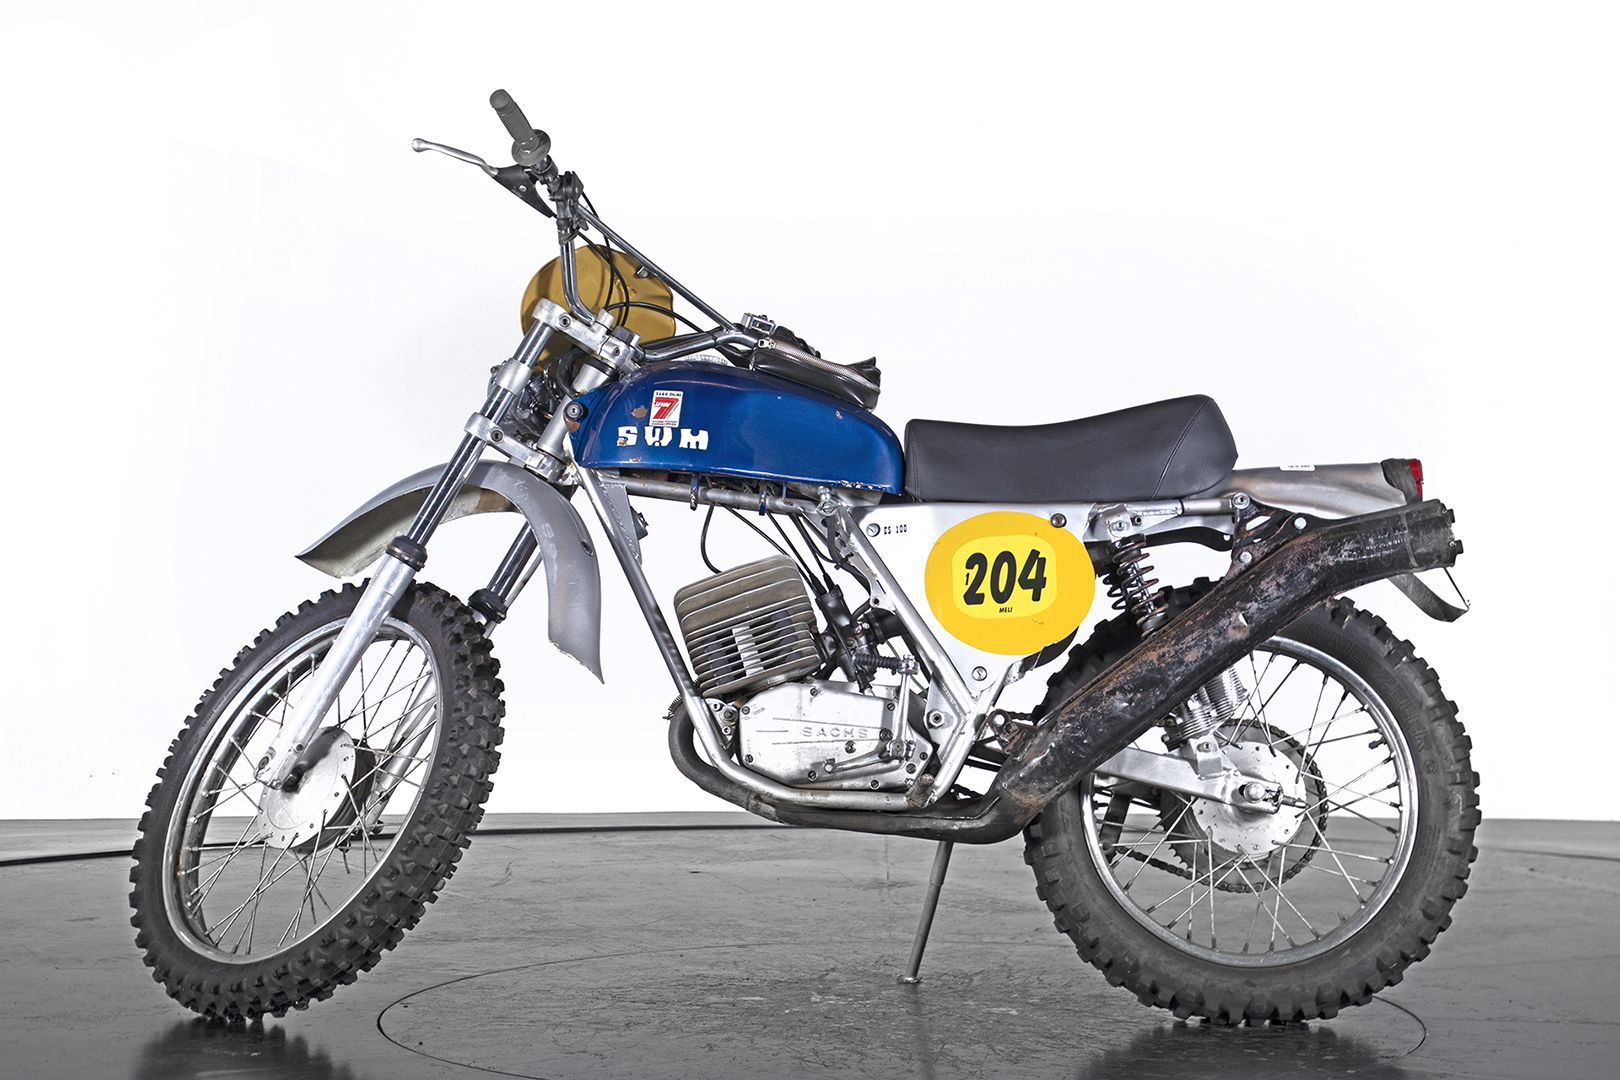 1974 SWM 125 53185